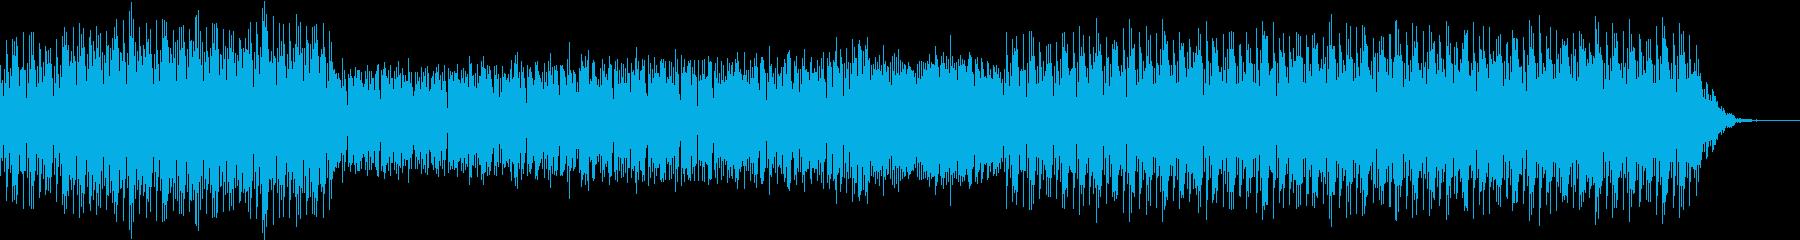 YouTuber用ファミコン風BGM2の再生済みの波形